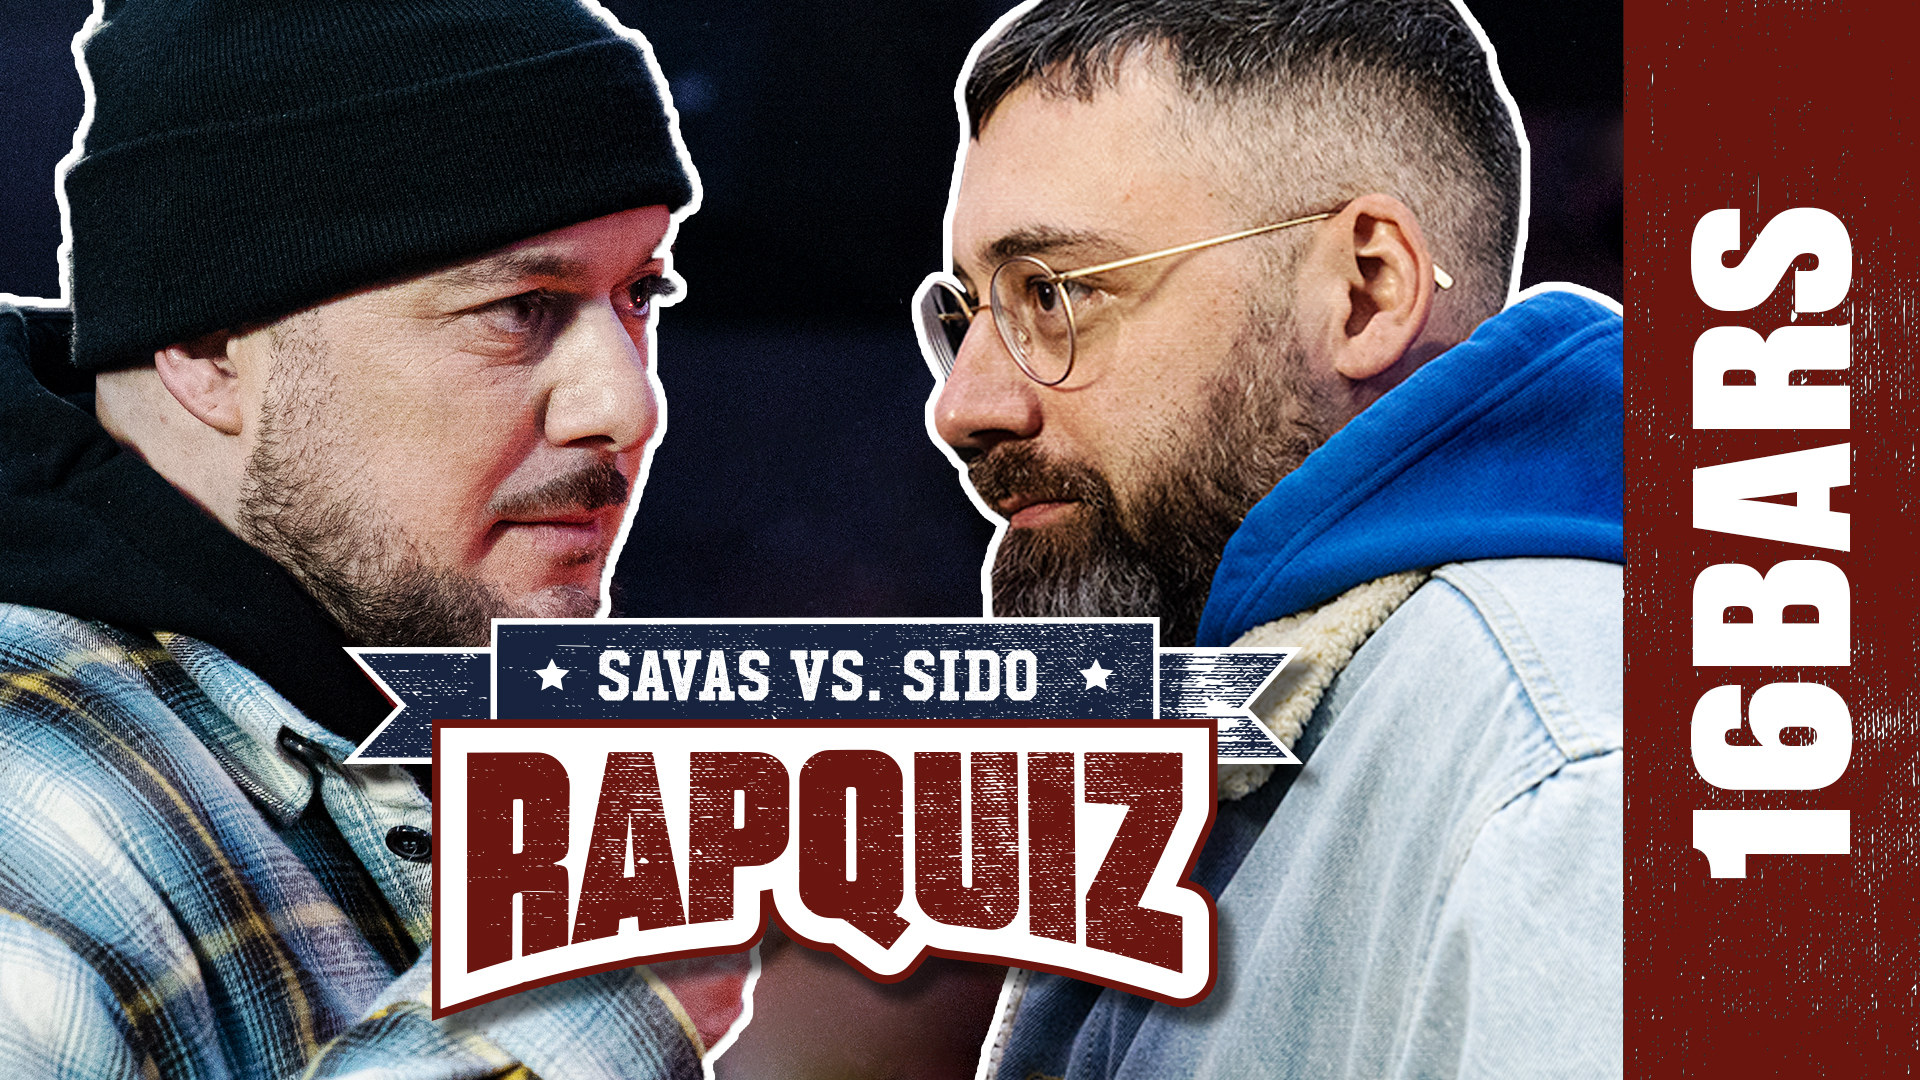 Sido vs. Savas - Das große Rapquiz-Finale | 16BARS